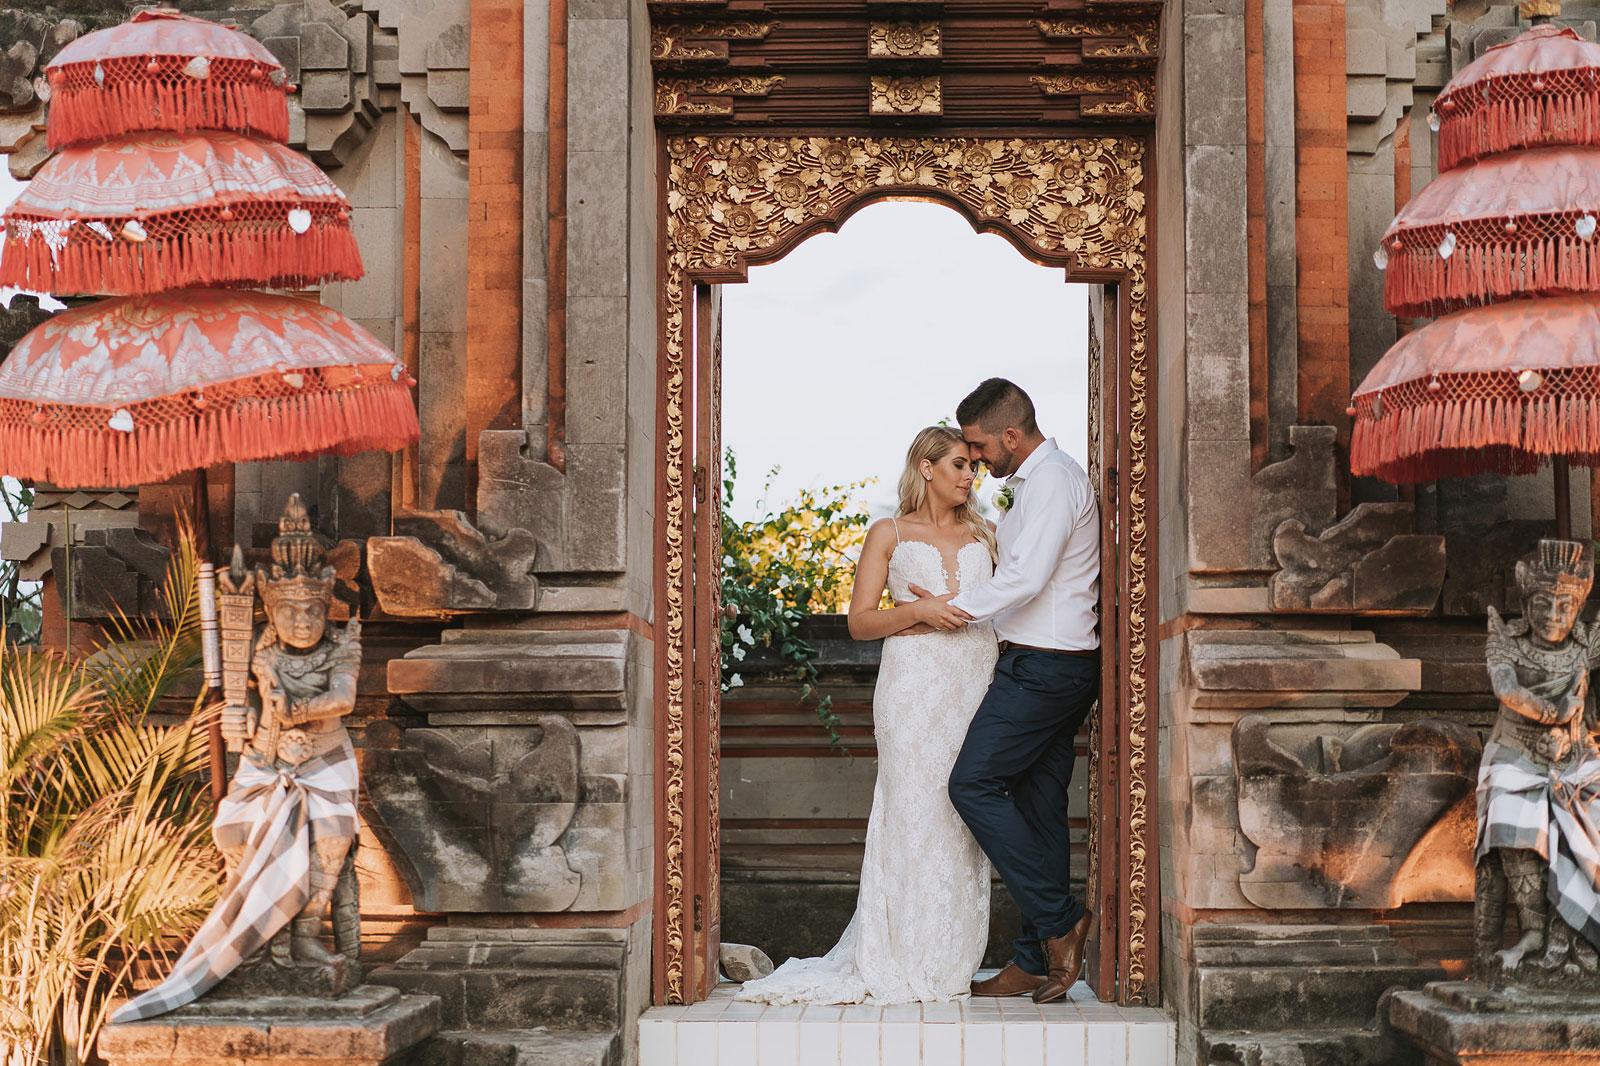 newfound-j-j-bali-nusa-dua-wedding-wedding-photographer-067-a